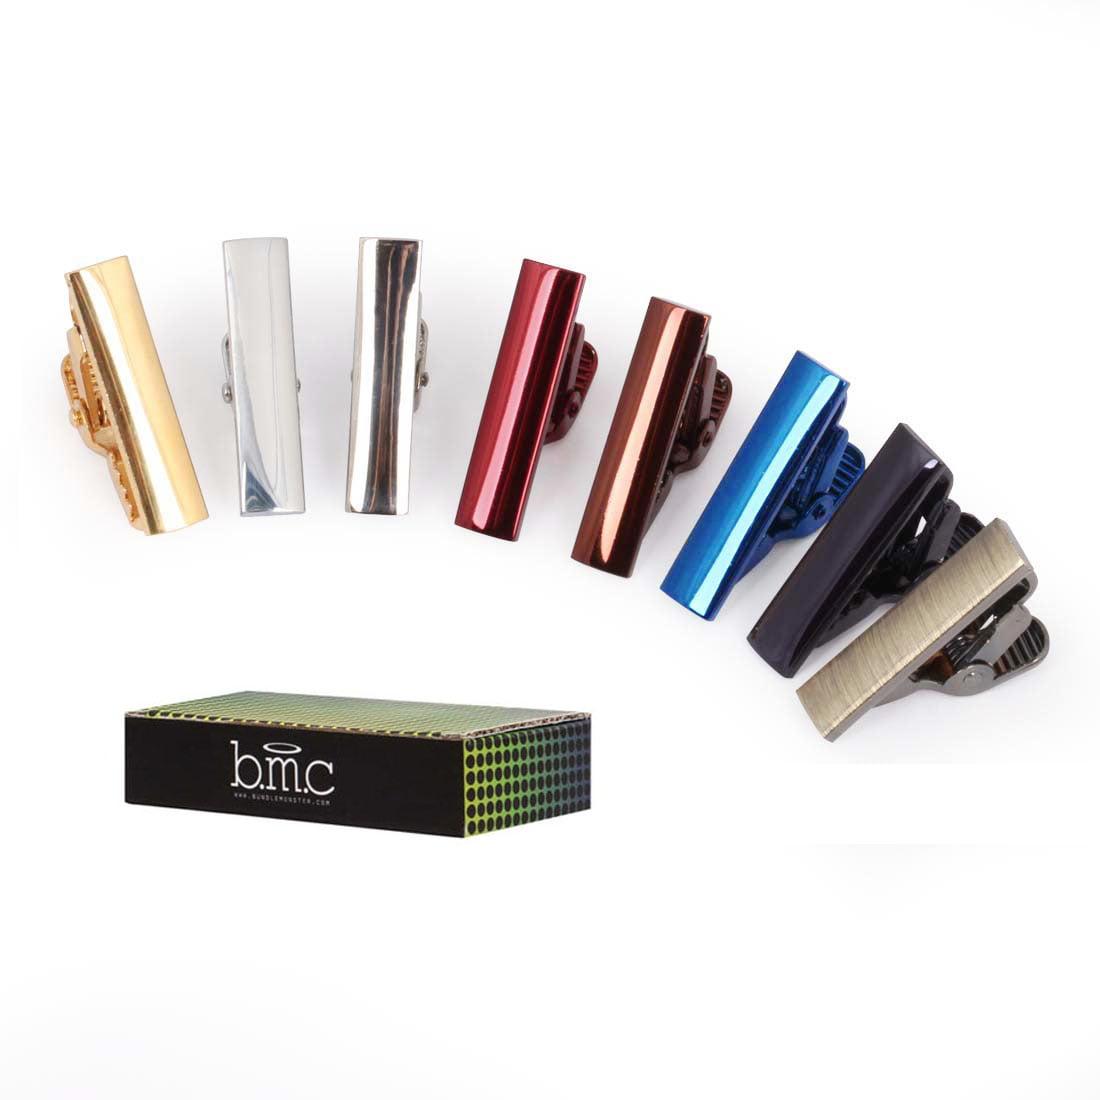 BMC 8pc Mens Fashion Alloy Metal 1 in. Metallic Colored Skinny Tie Bar Half Clips